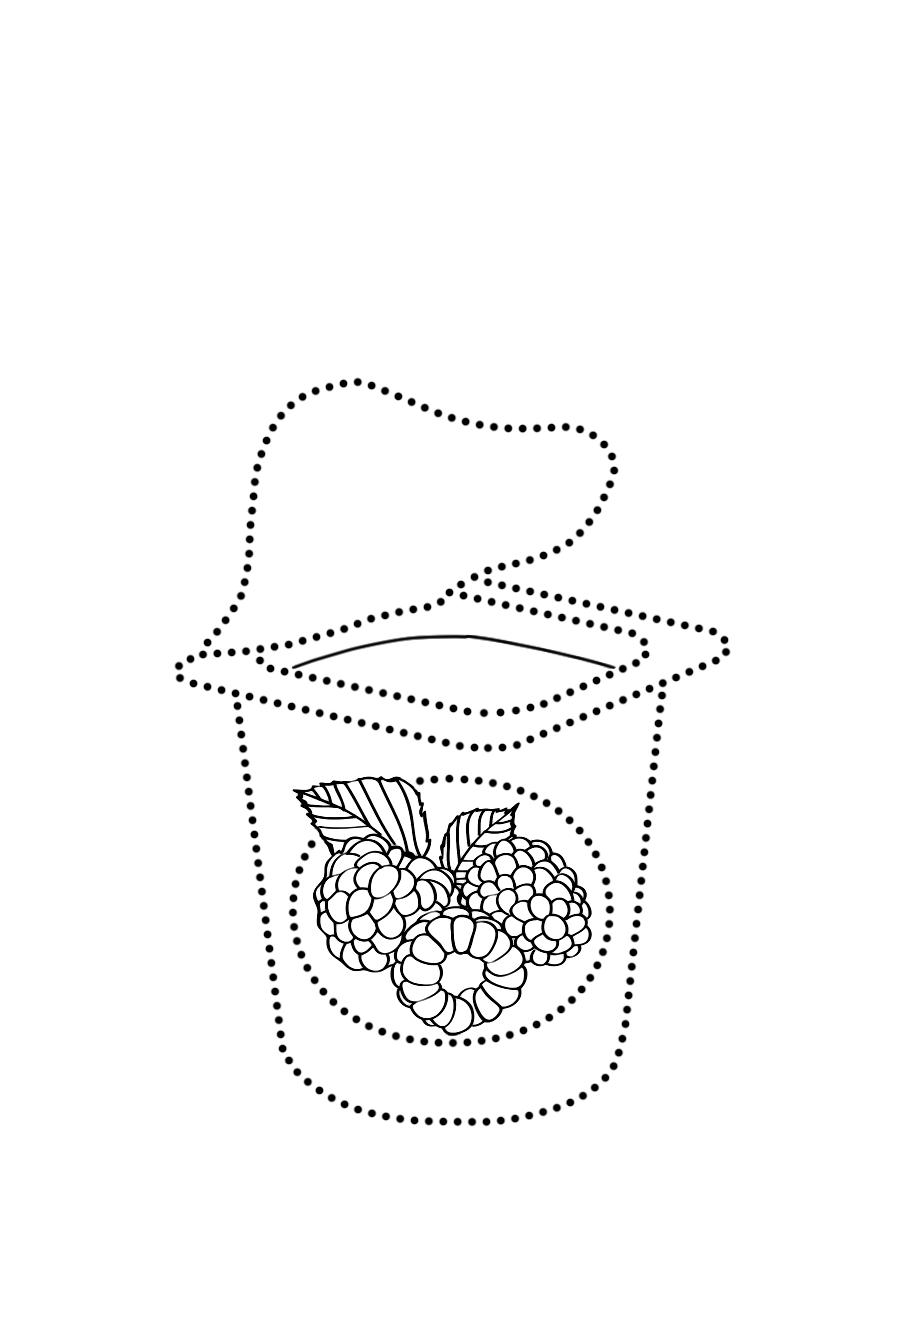 Йогурт по точкам - Рисуем по точкам - Раскраски антистресс